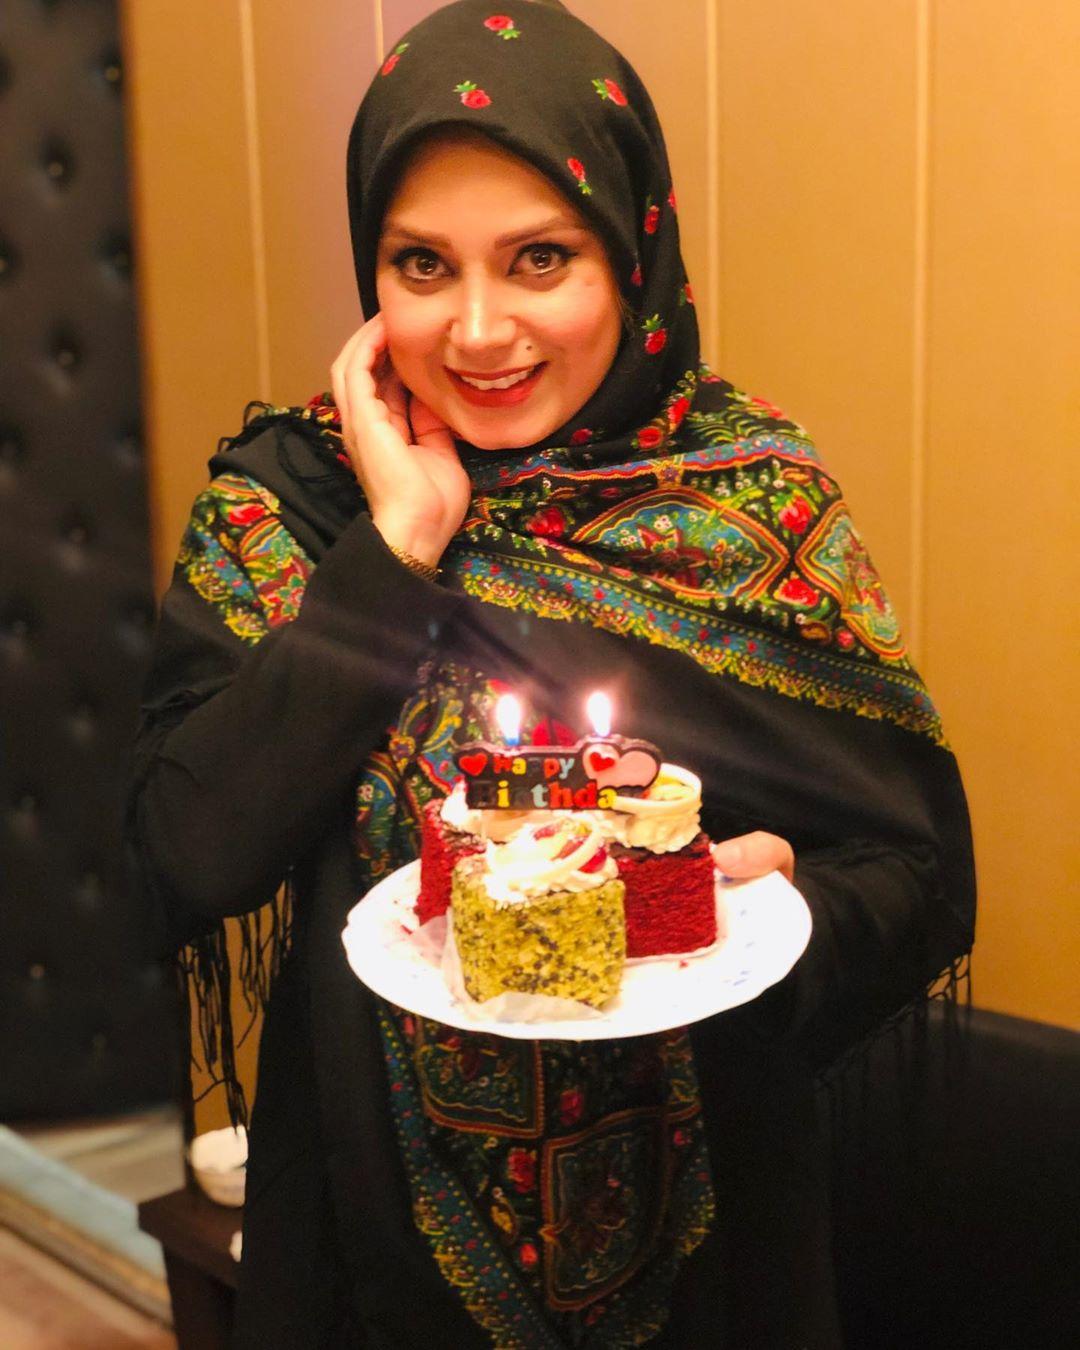 صبا راد خلال الاحتفال بعيد ميلادها